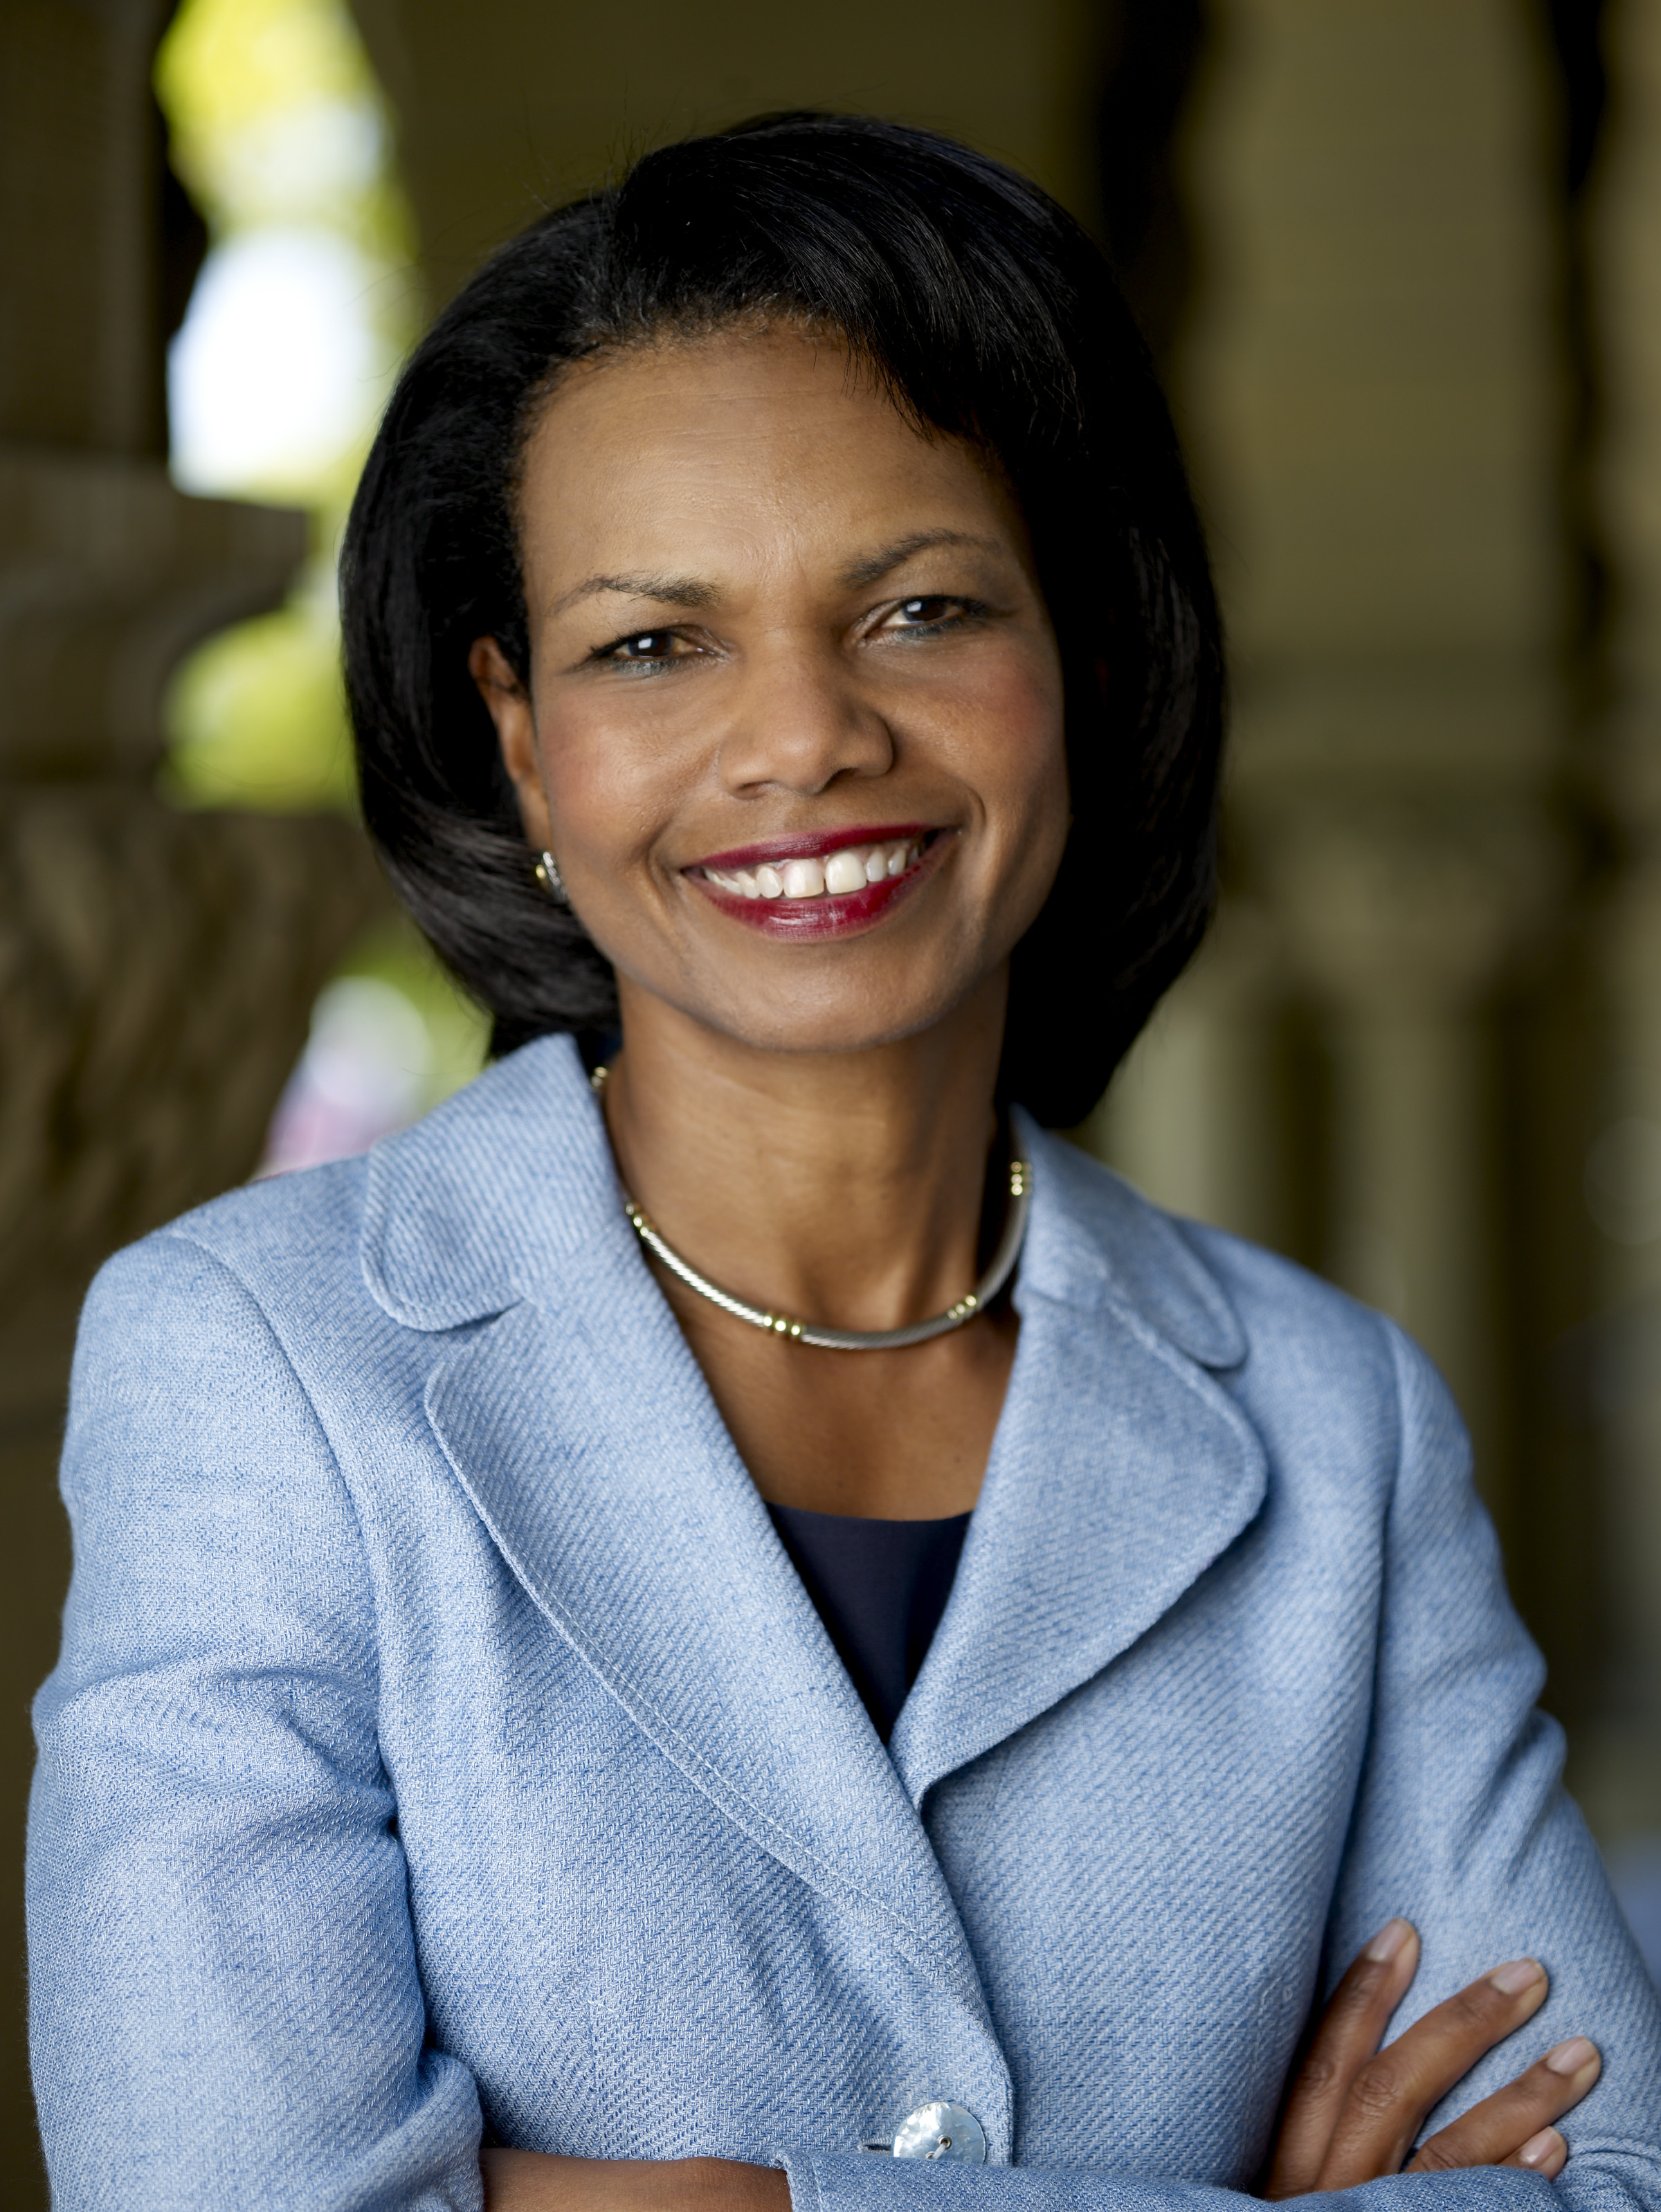 Condoleezza Rice RSNA 2013 U.S. Secretary of State Imaging